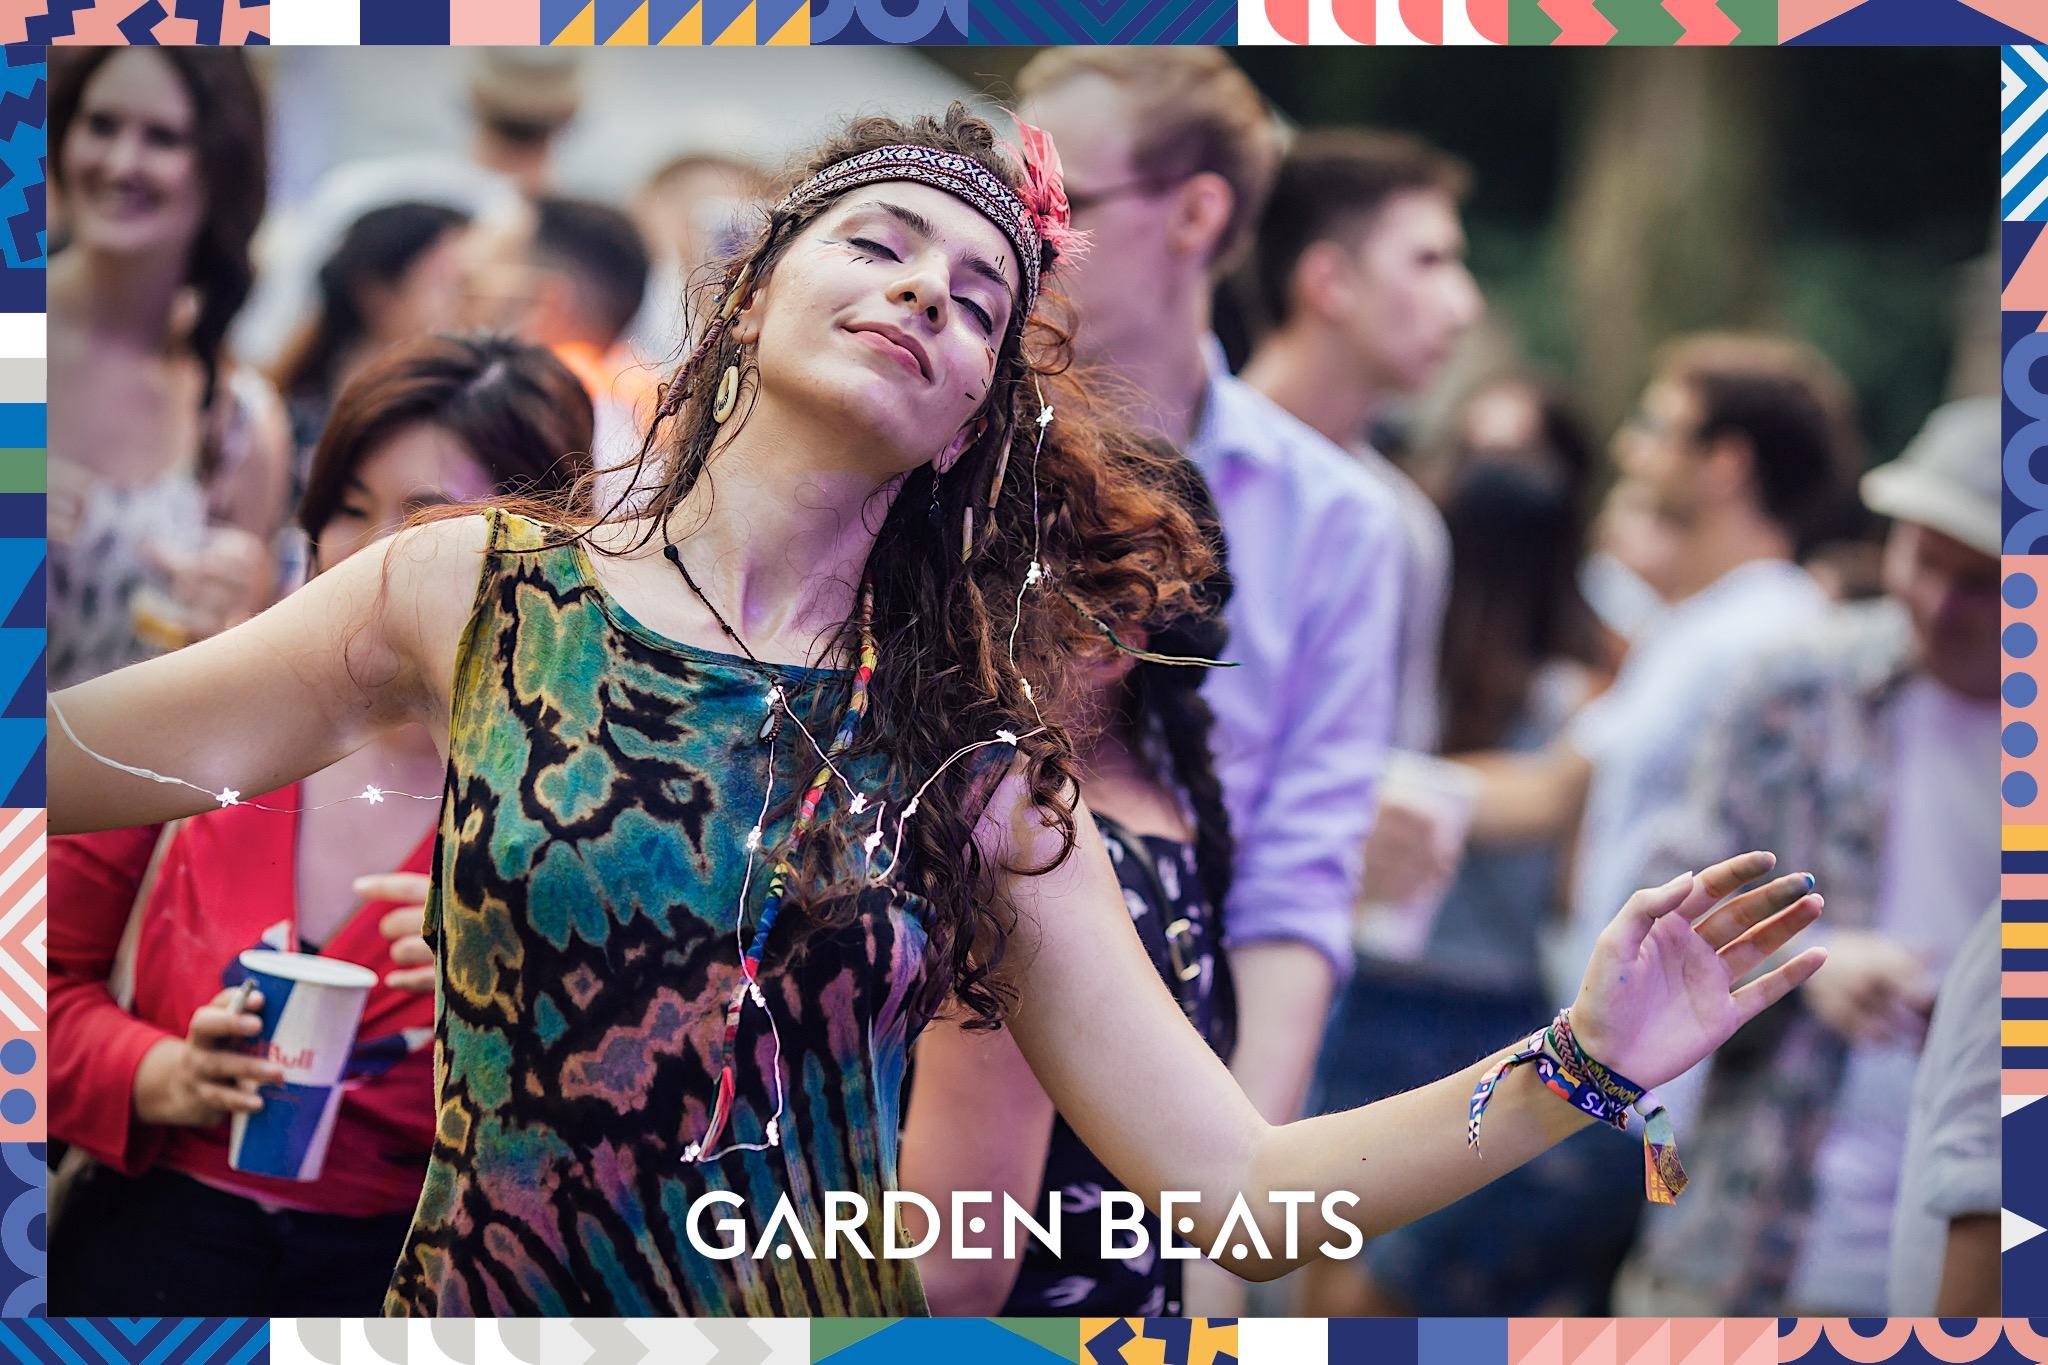 18032017_GardenBeats_Colossal601_WatermarkedGB.jpg